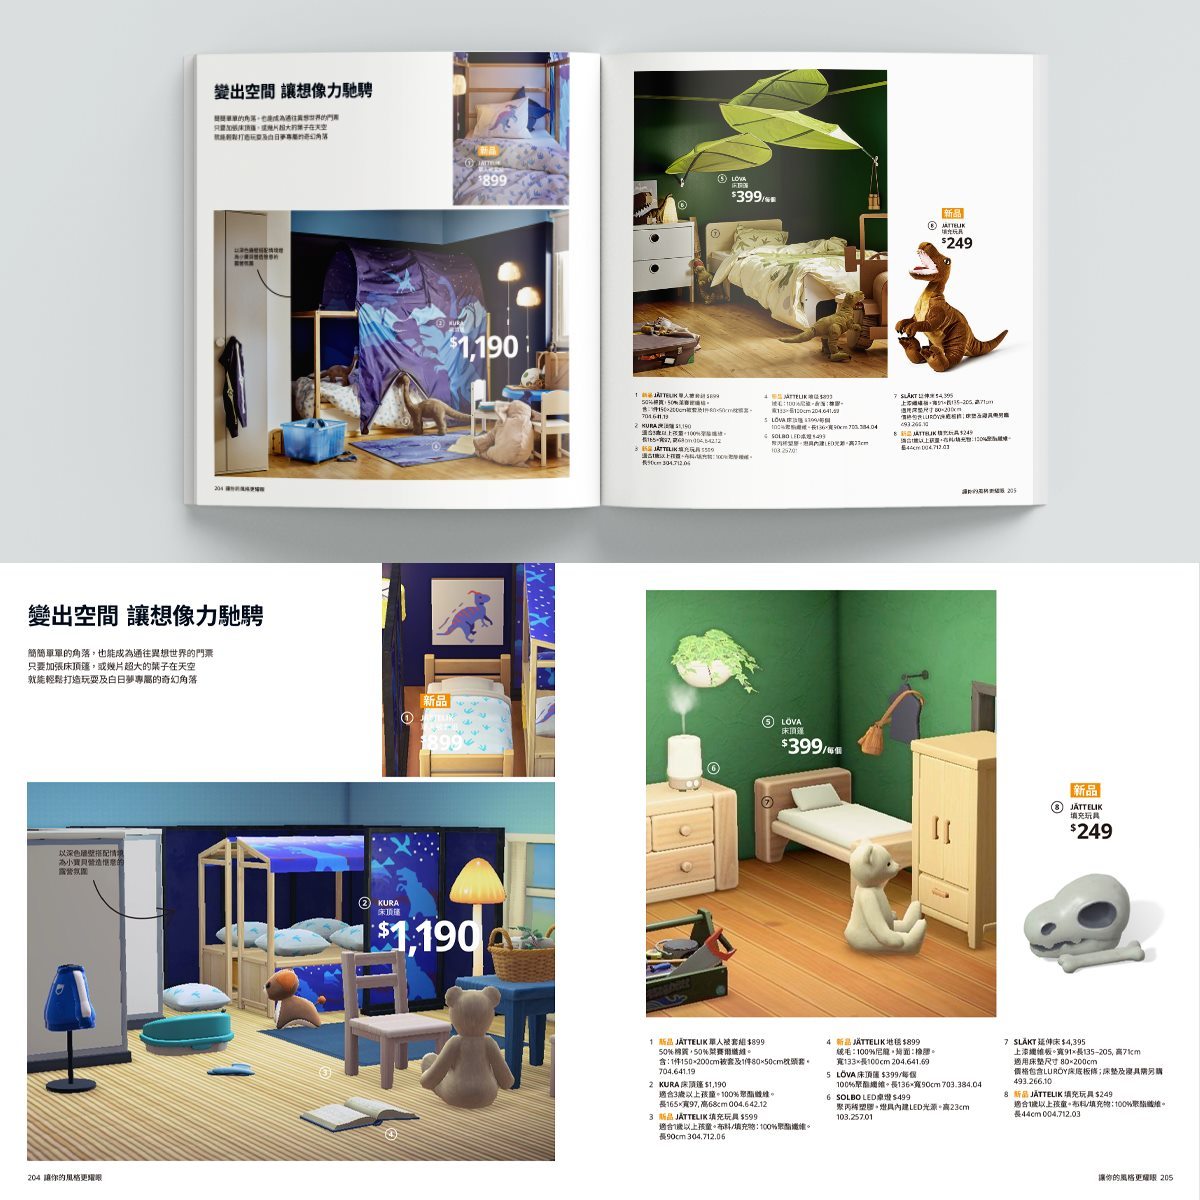 IKEA TW x Animal Crossing